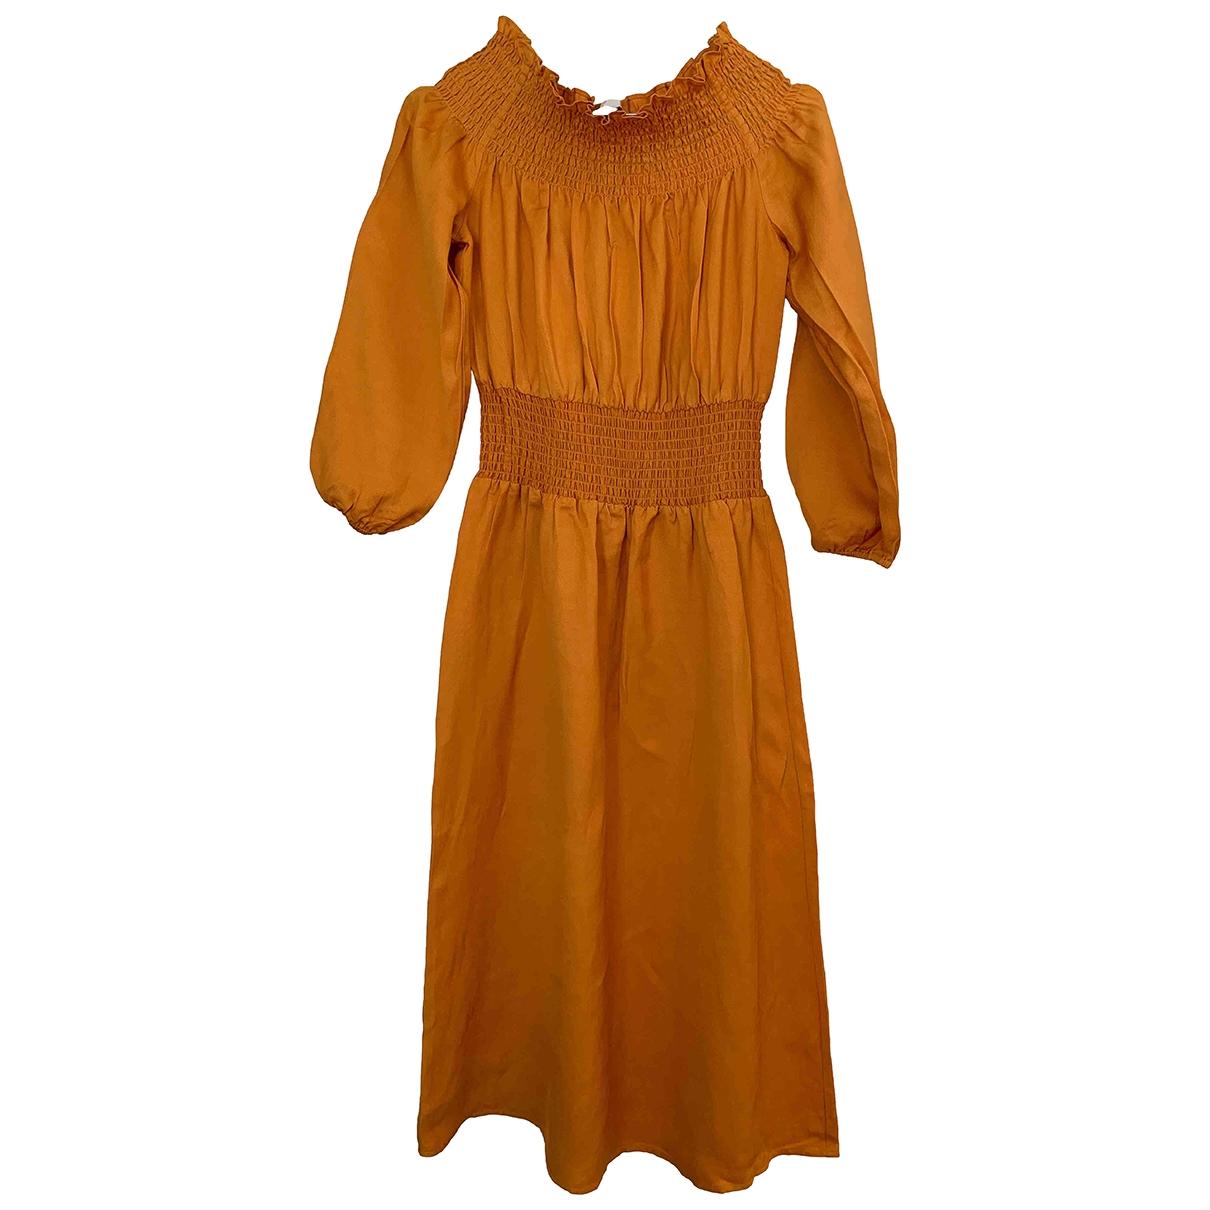 Maje Spring Summer 2019 Yellow dress for Women 3 0-5